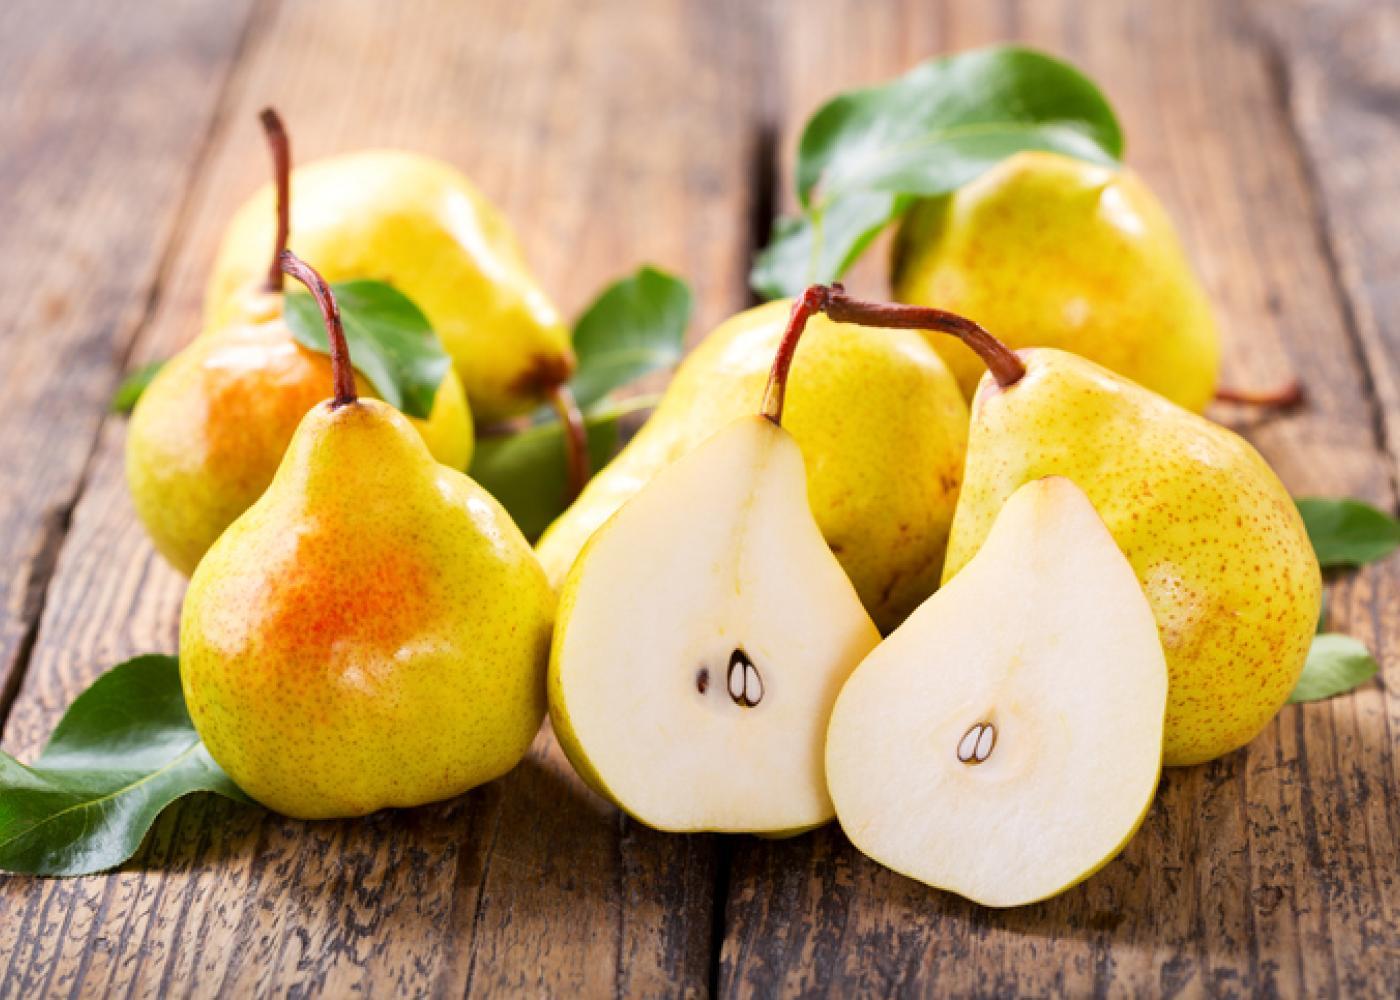 https://snaped.fns.usda.gov/sites/default/files/styles/crop_ratio_7_5/public/seasonal-produce/2018-05/pears.jpg?itok=CGjollRu